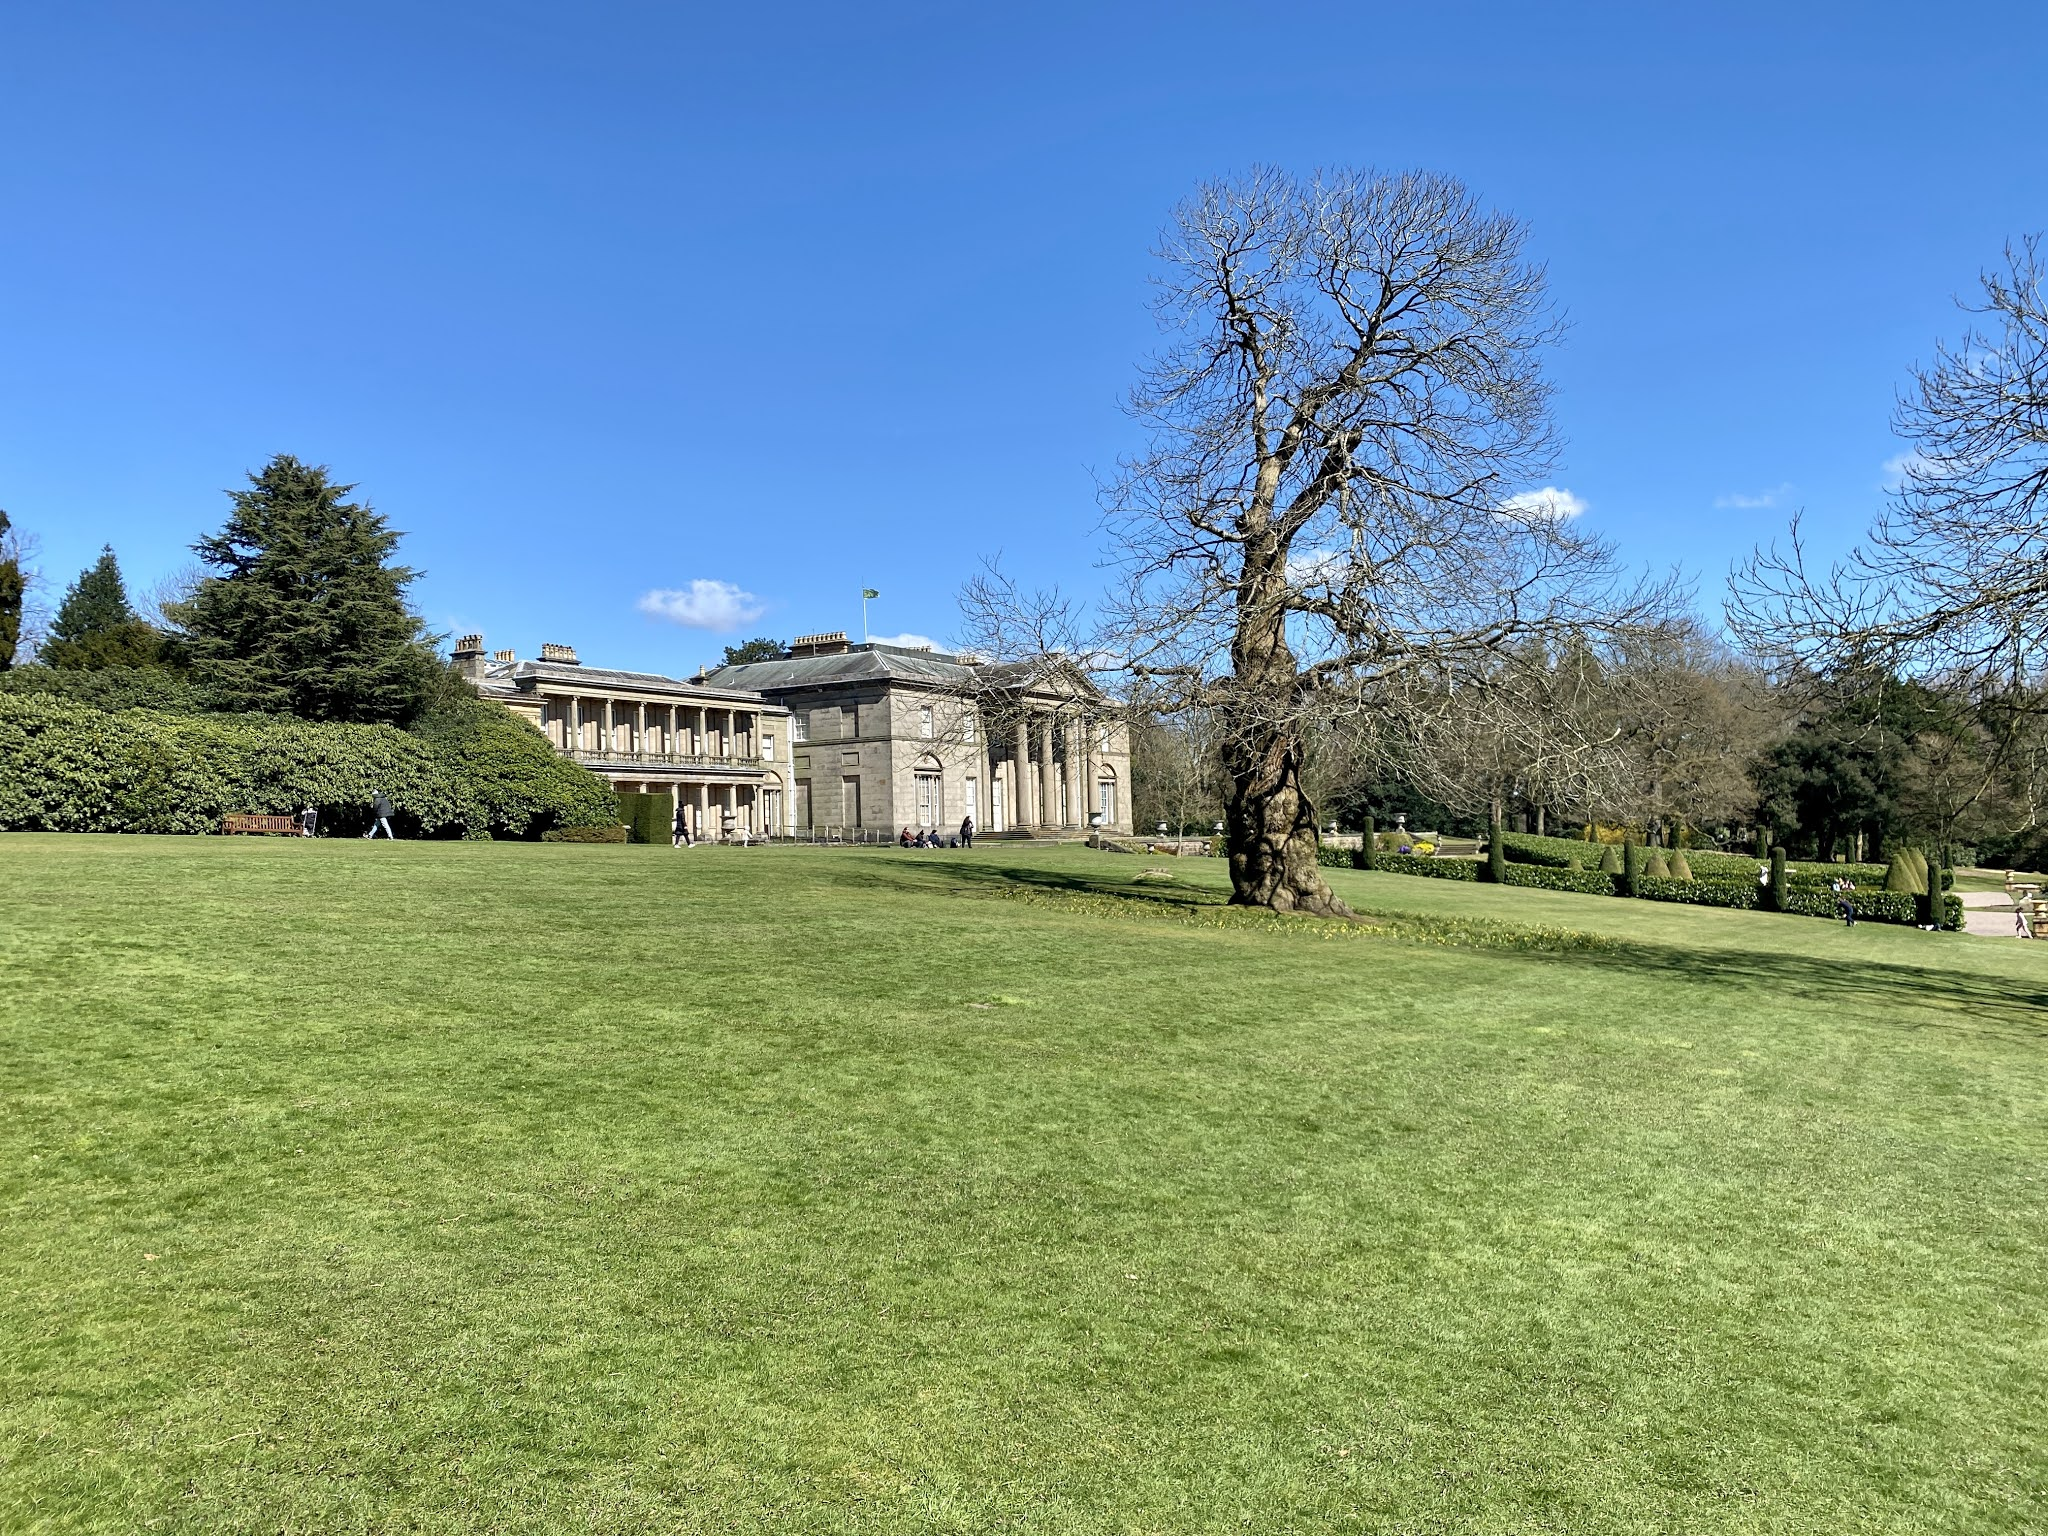 Tatton gardens